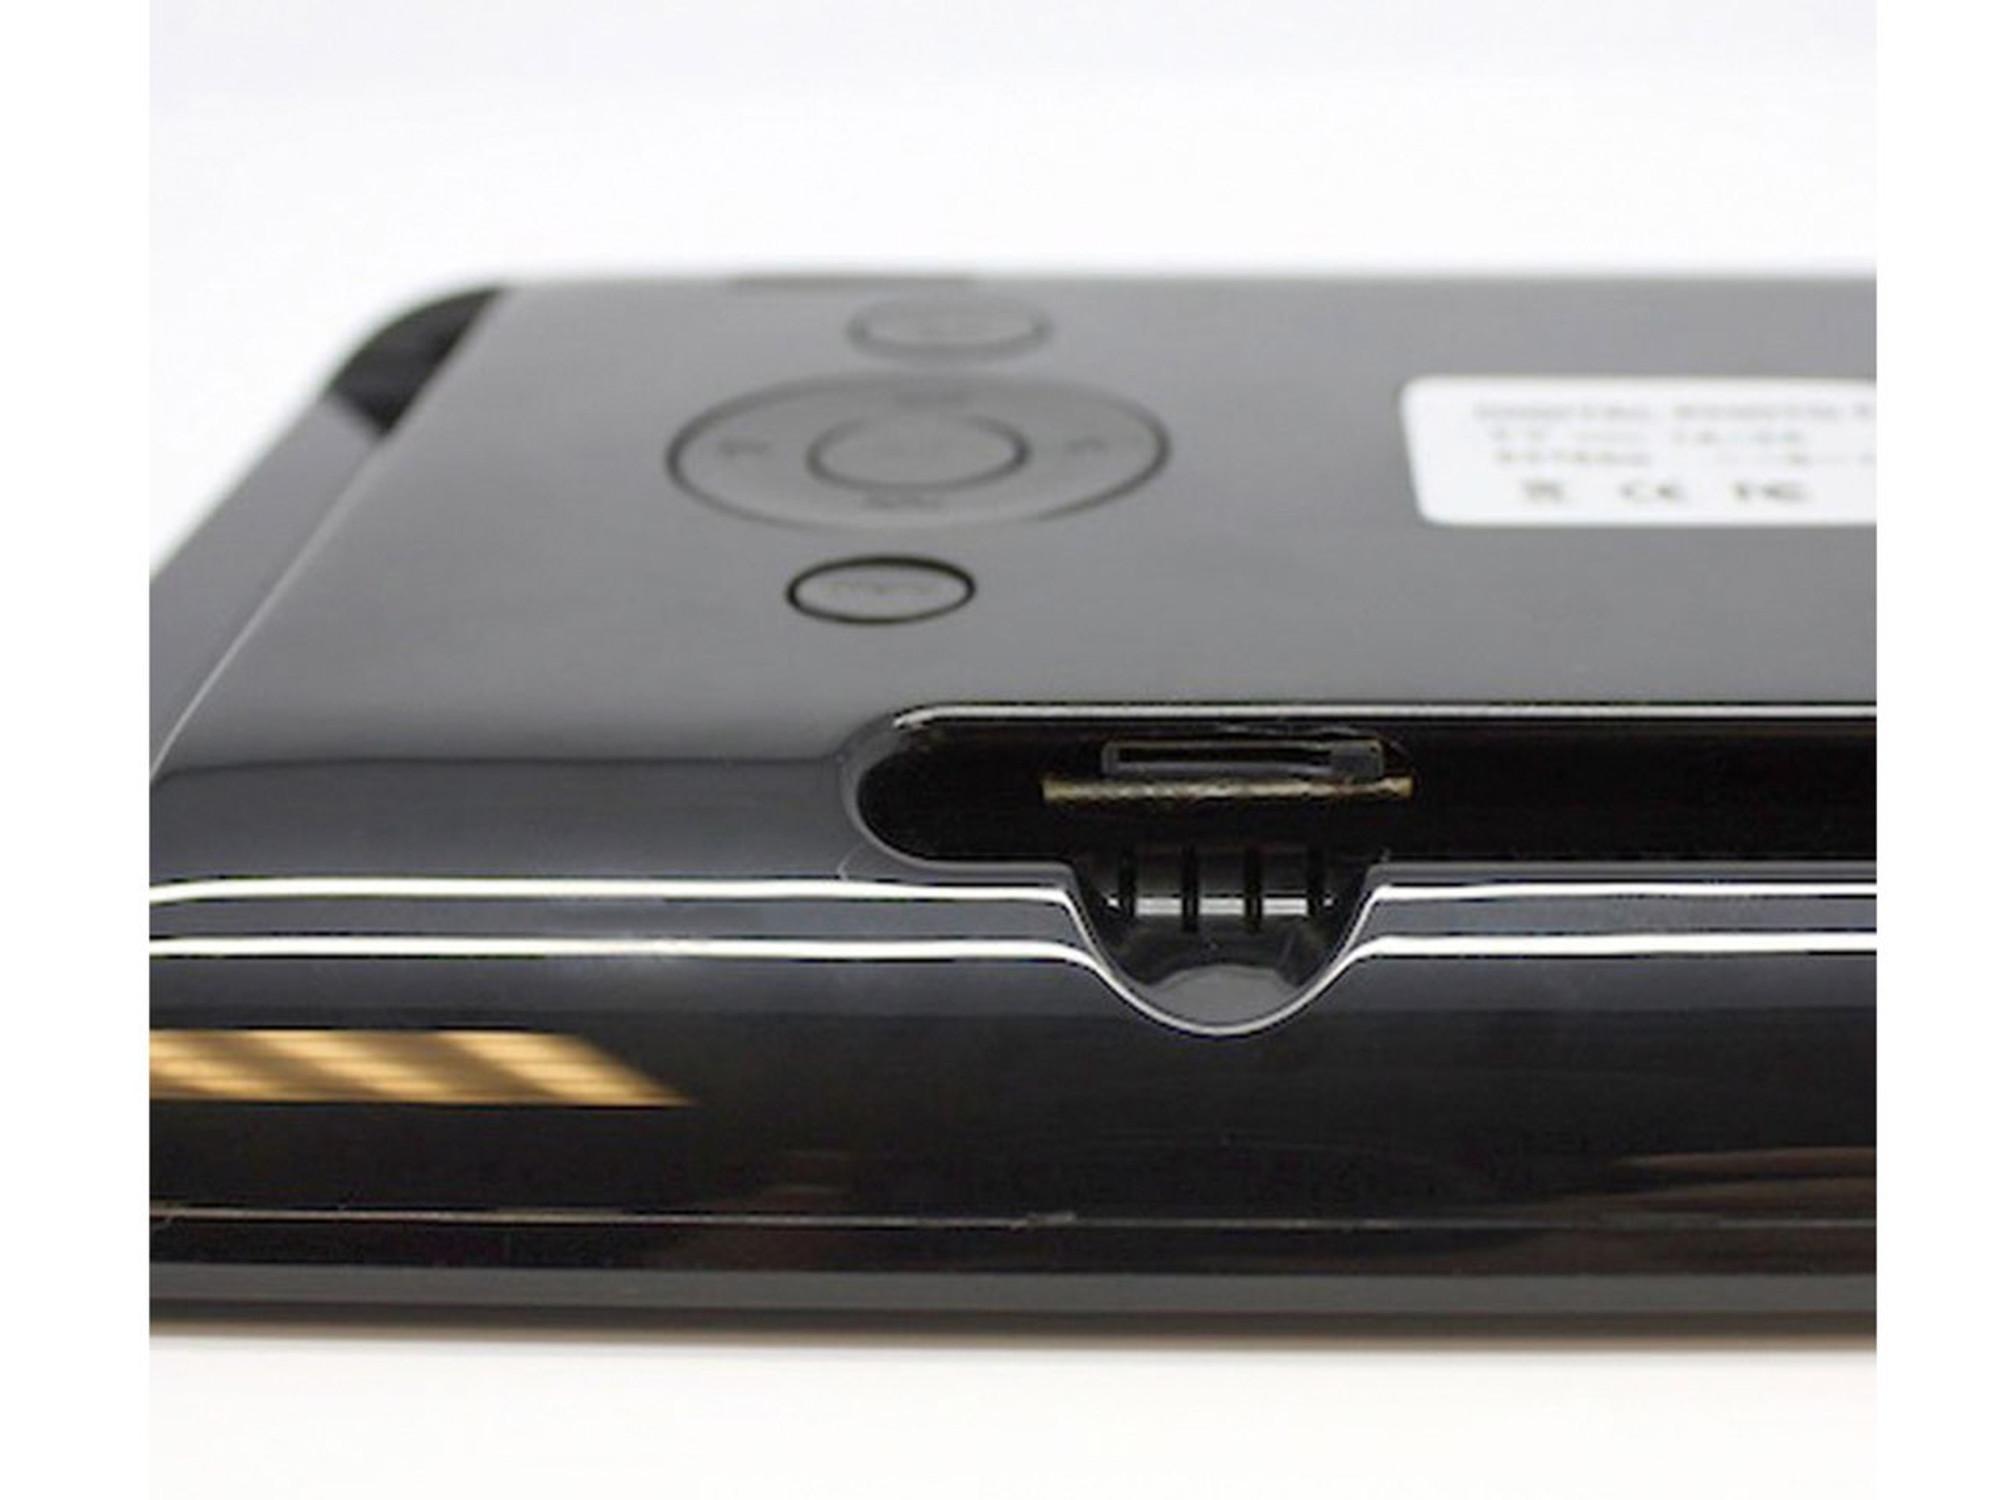 Picture Frame Hidden Camera - Shop Best Selling Hidden Cameras